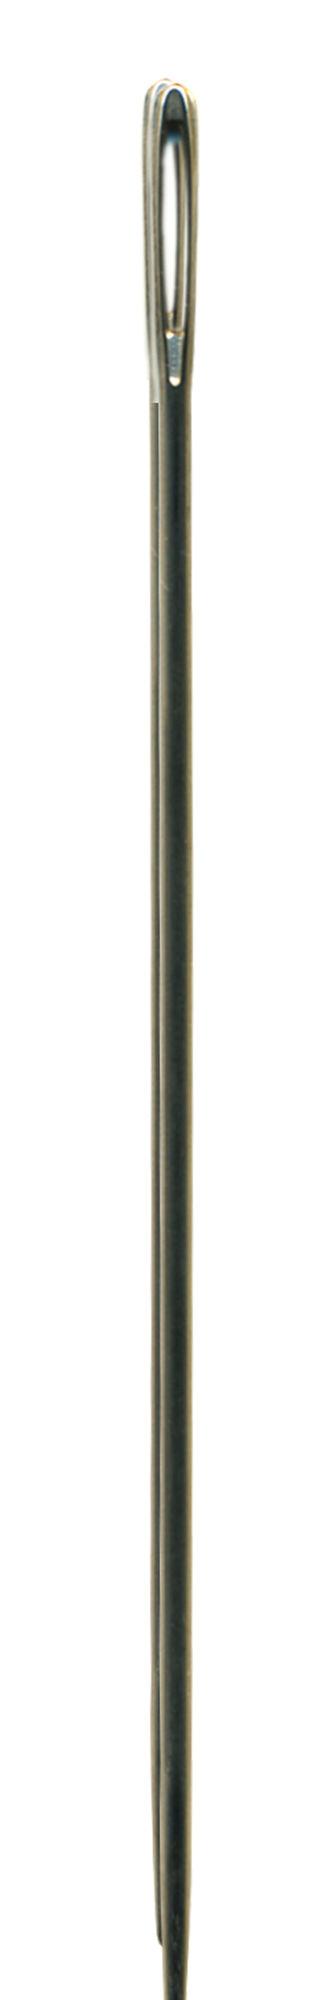 "5"" Steel Needle (Susan Bates)"